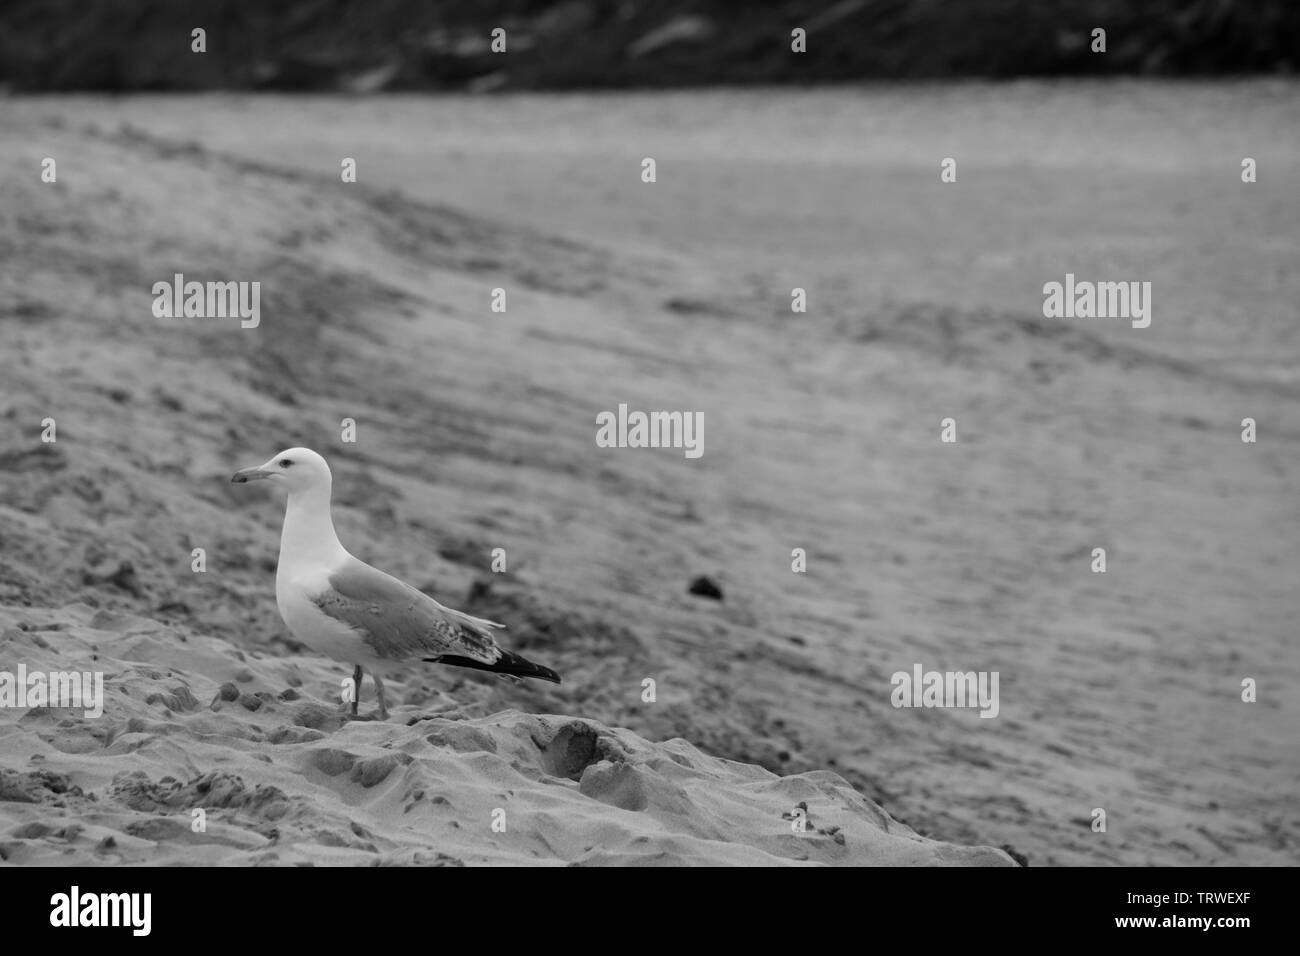 sea gull on a beach - Stock Image